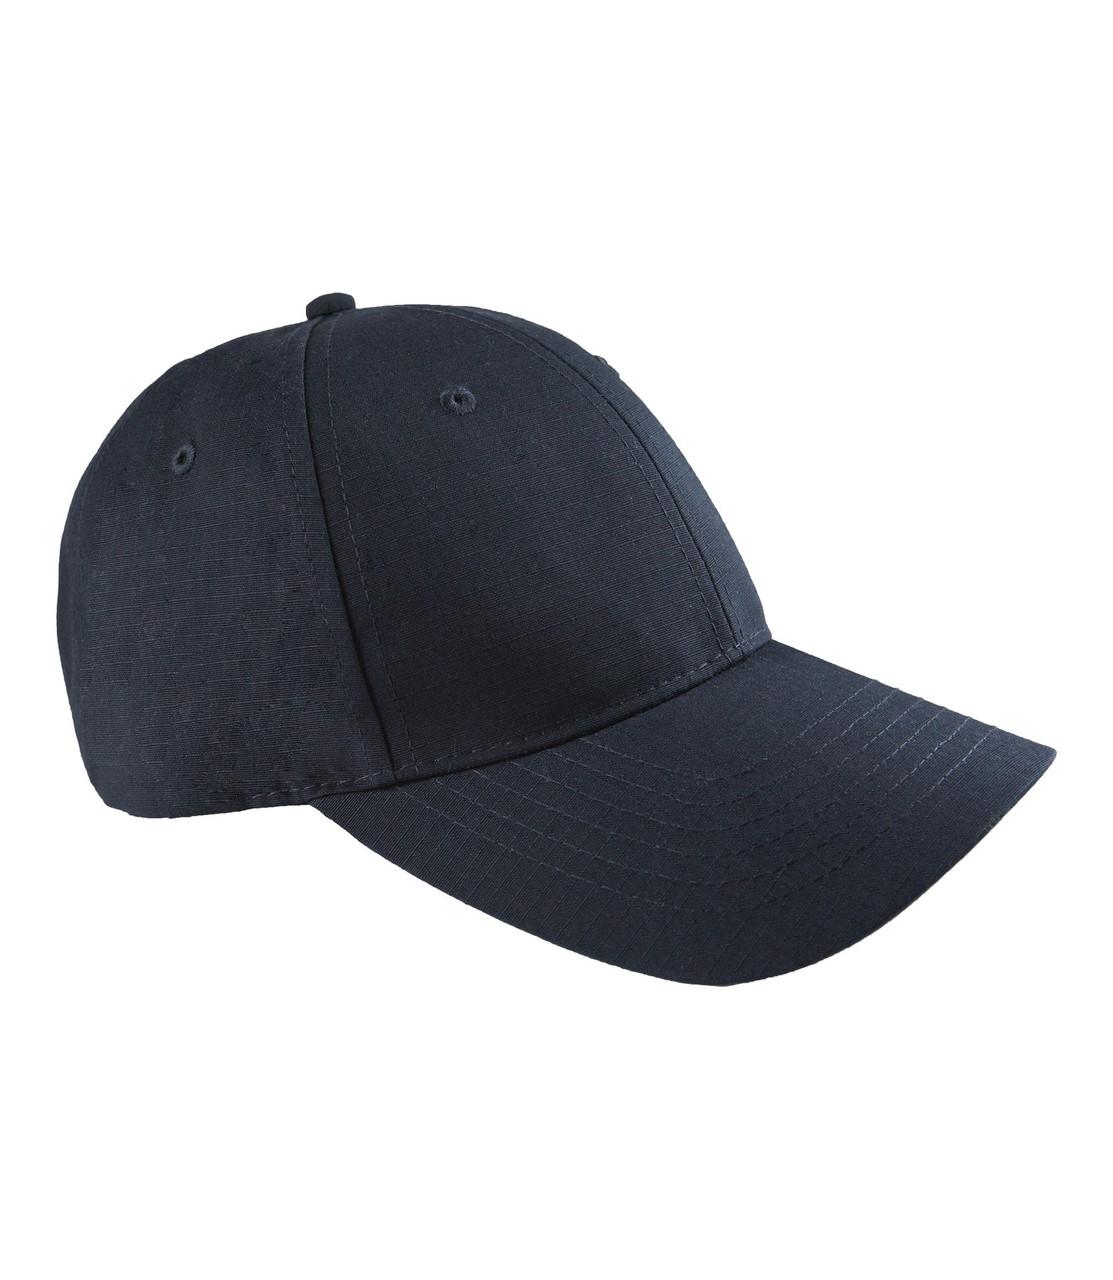 Adjustable Blank Hat